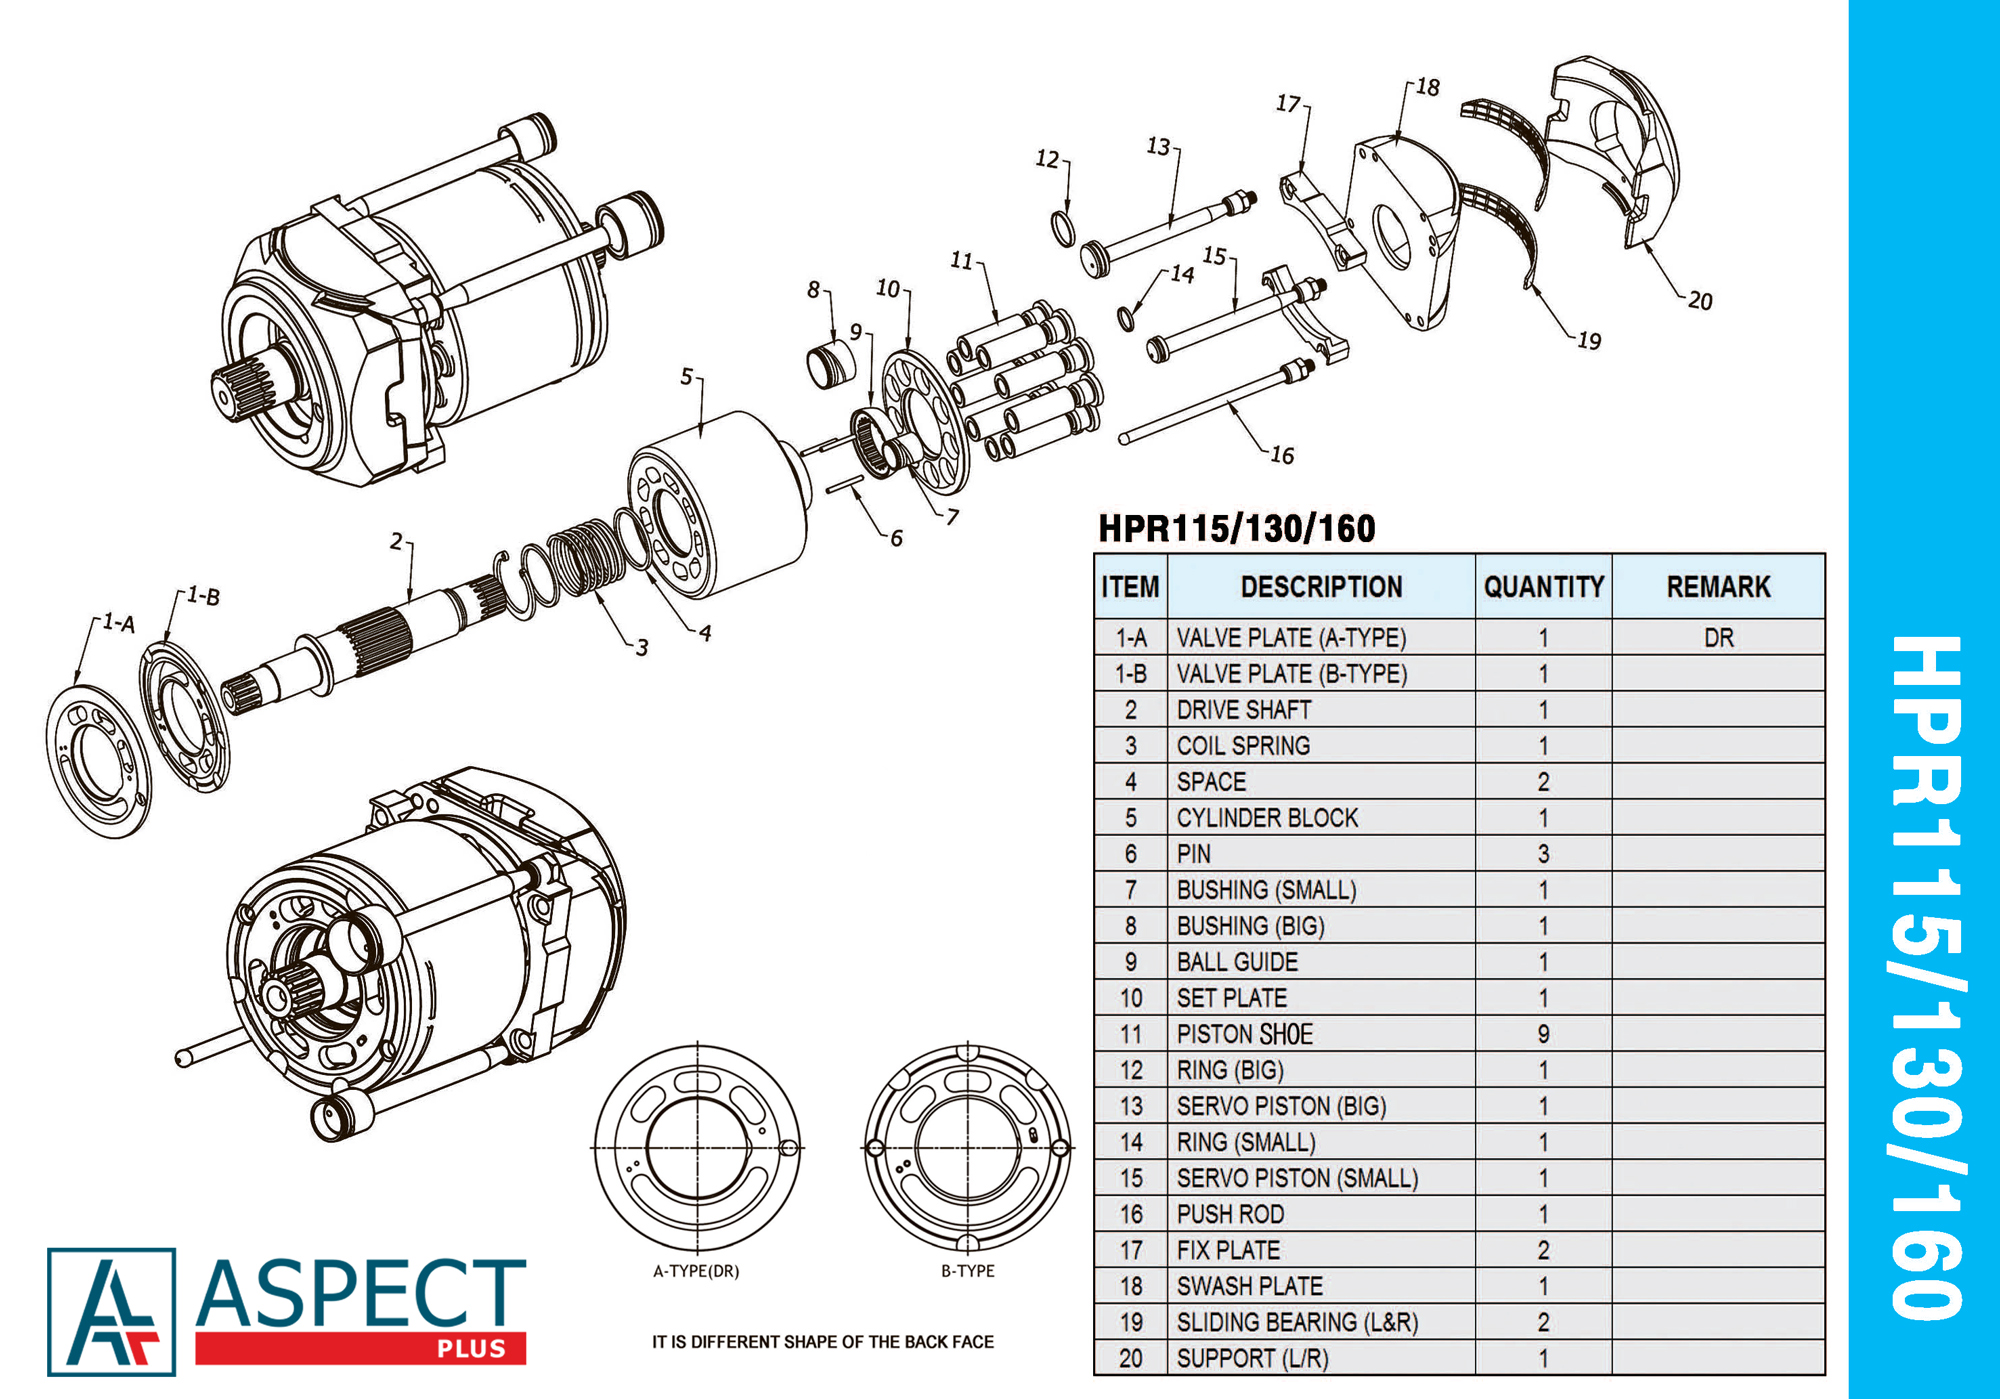 LINDE HPR115 HPR130 HPR160 assembly diagram